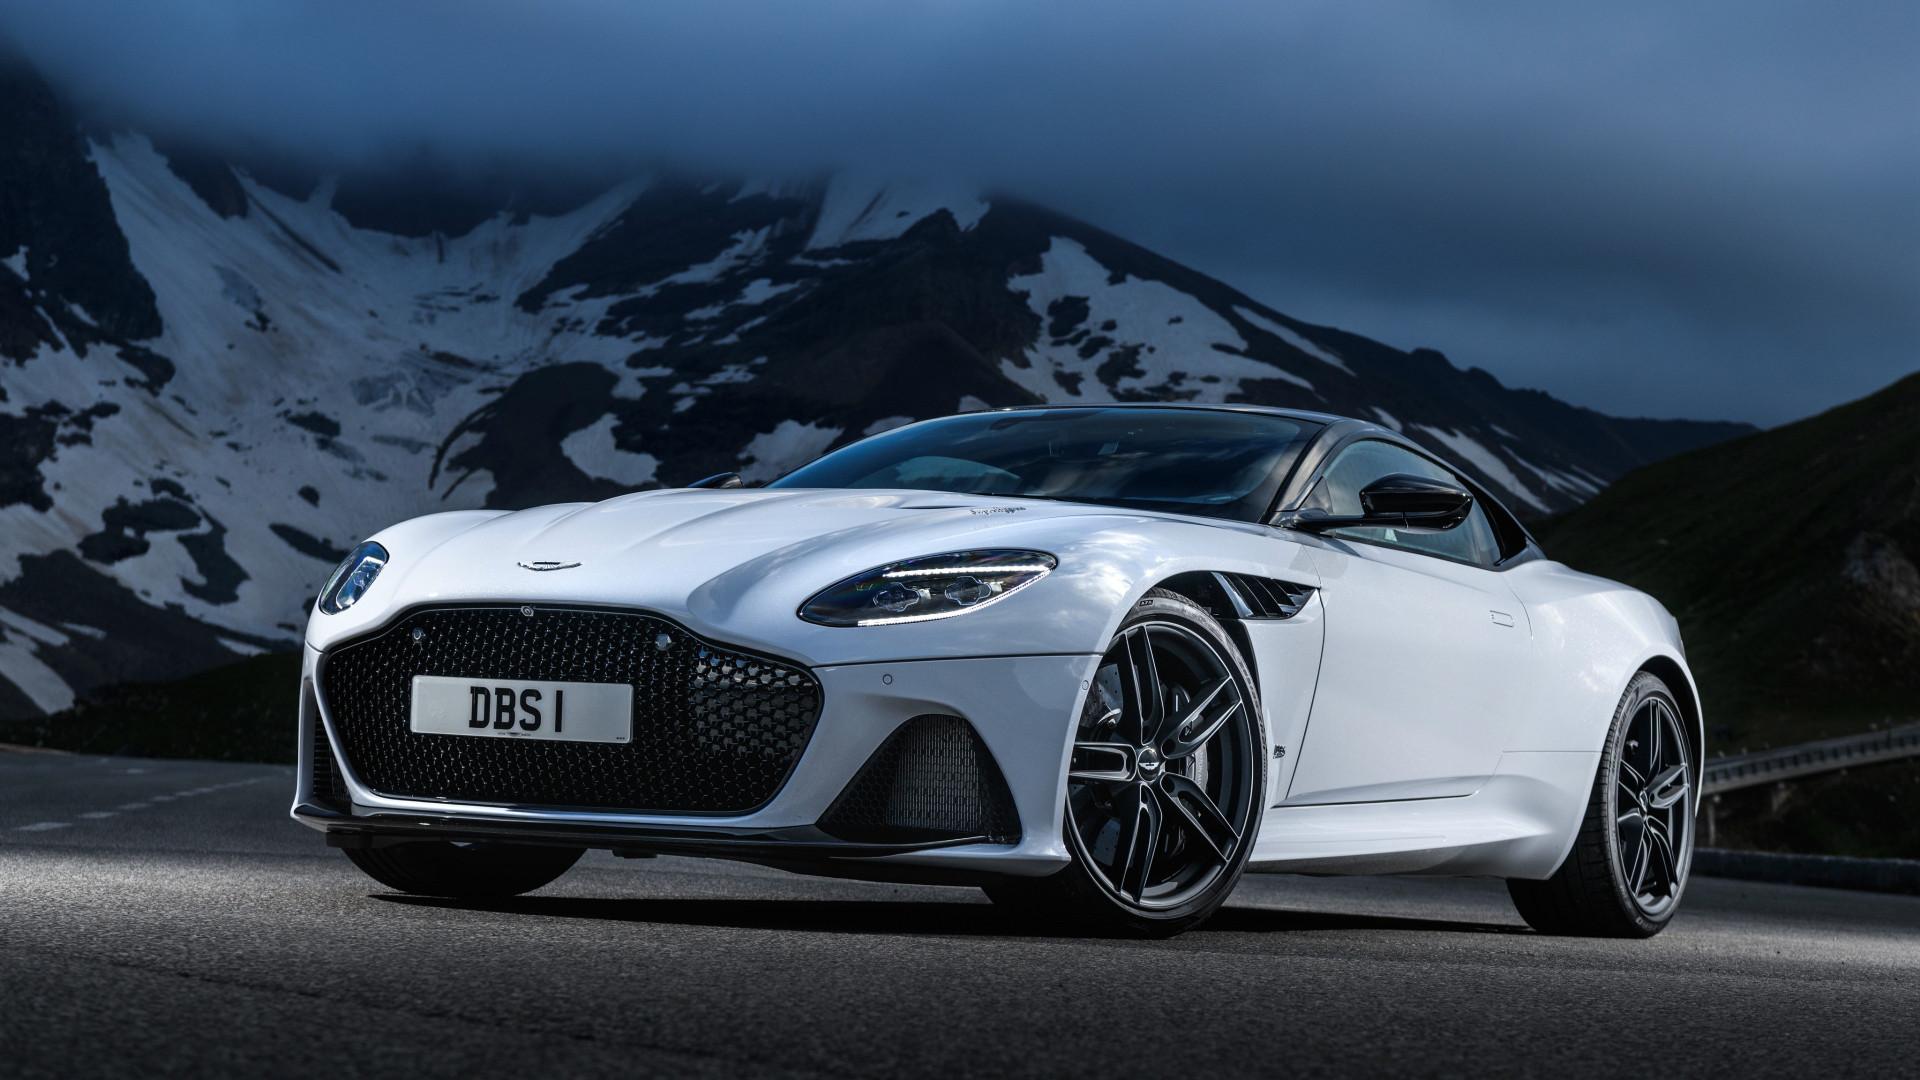 Download Wallpaper Aston Martin Dbs Superleggera 2018 1920x1080